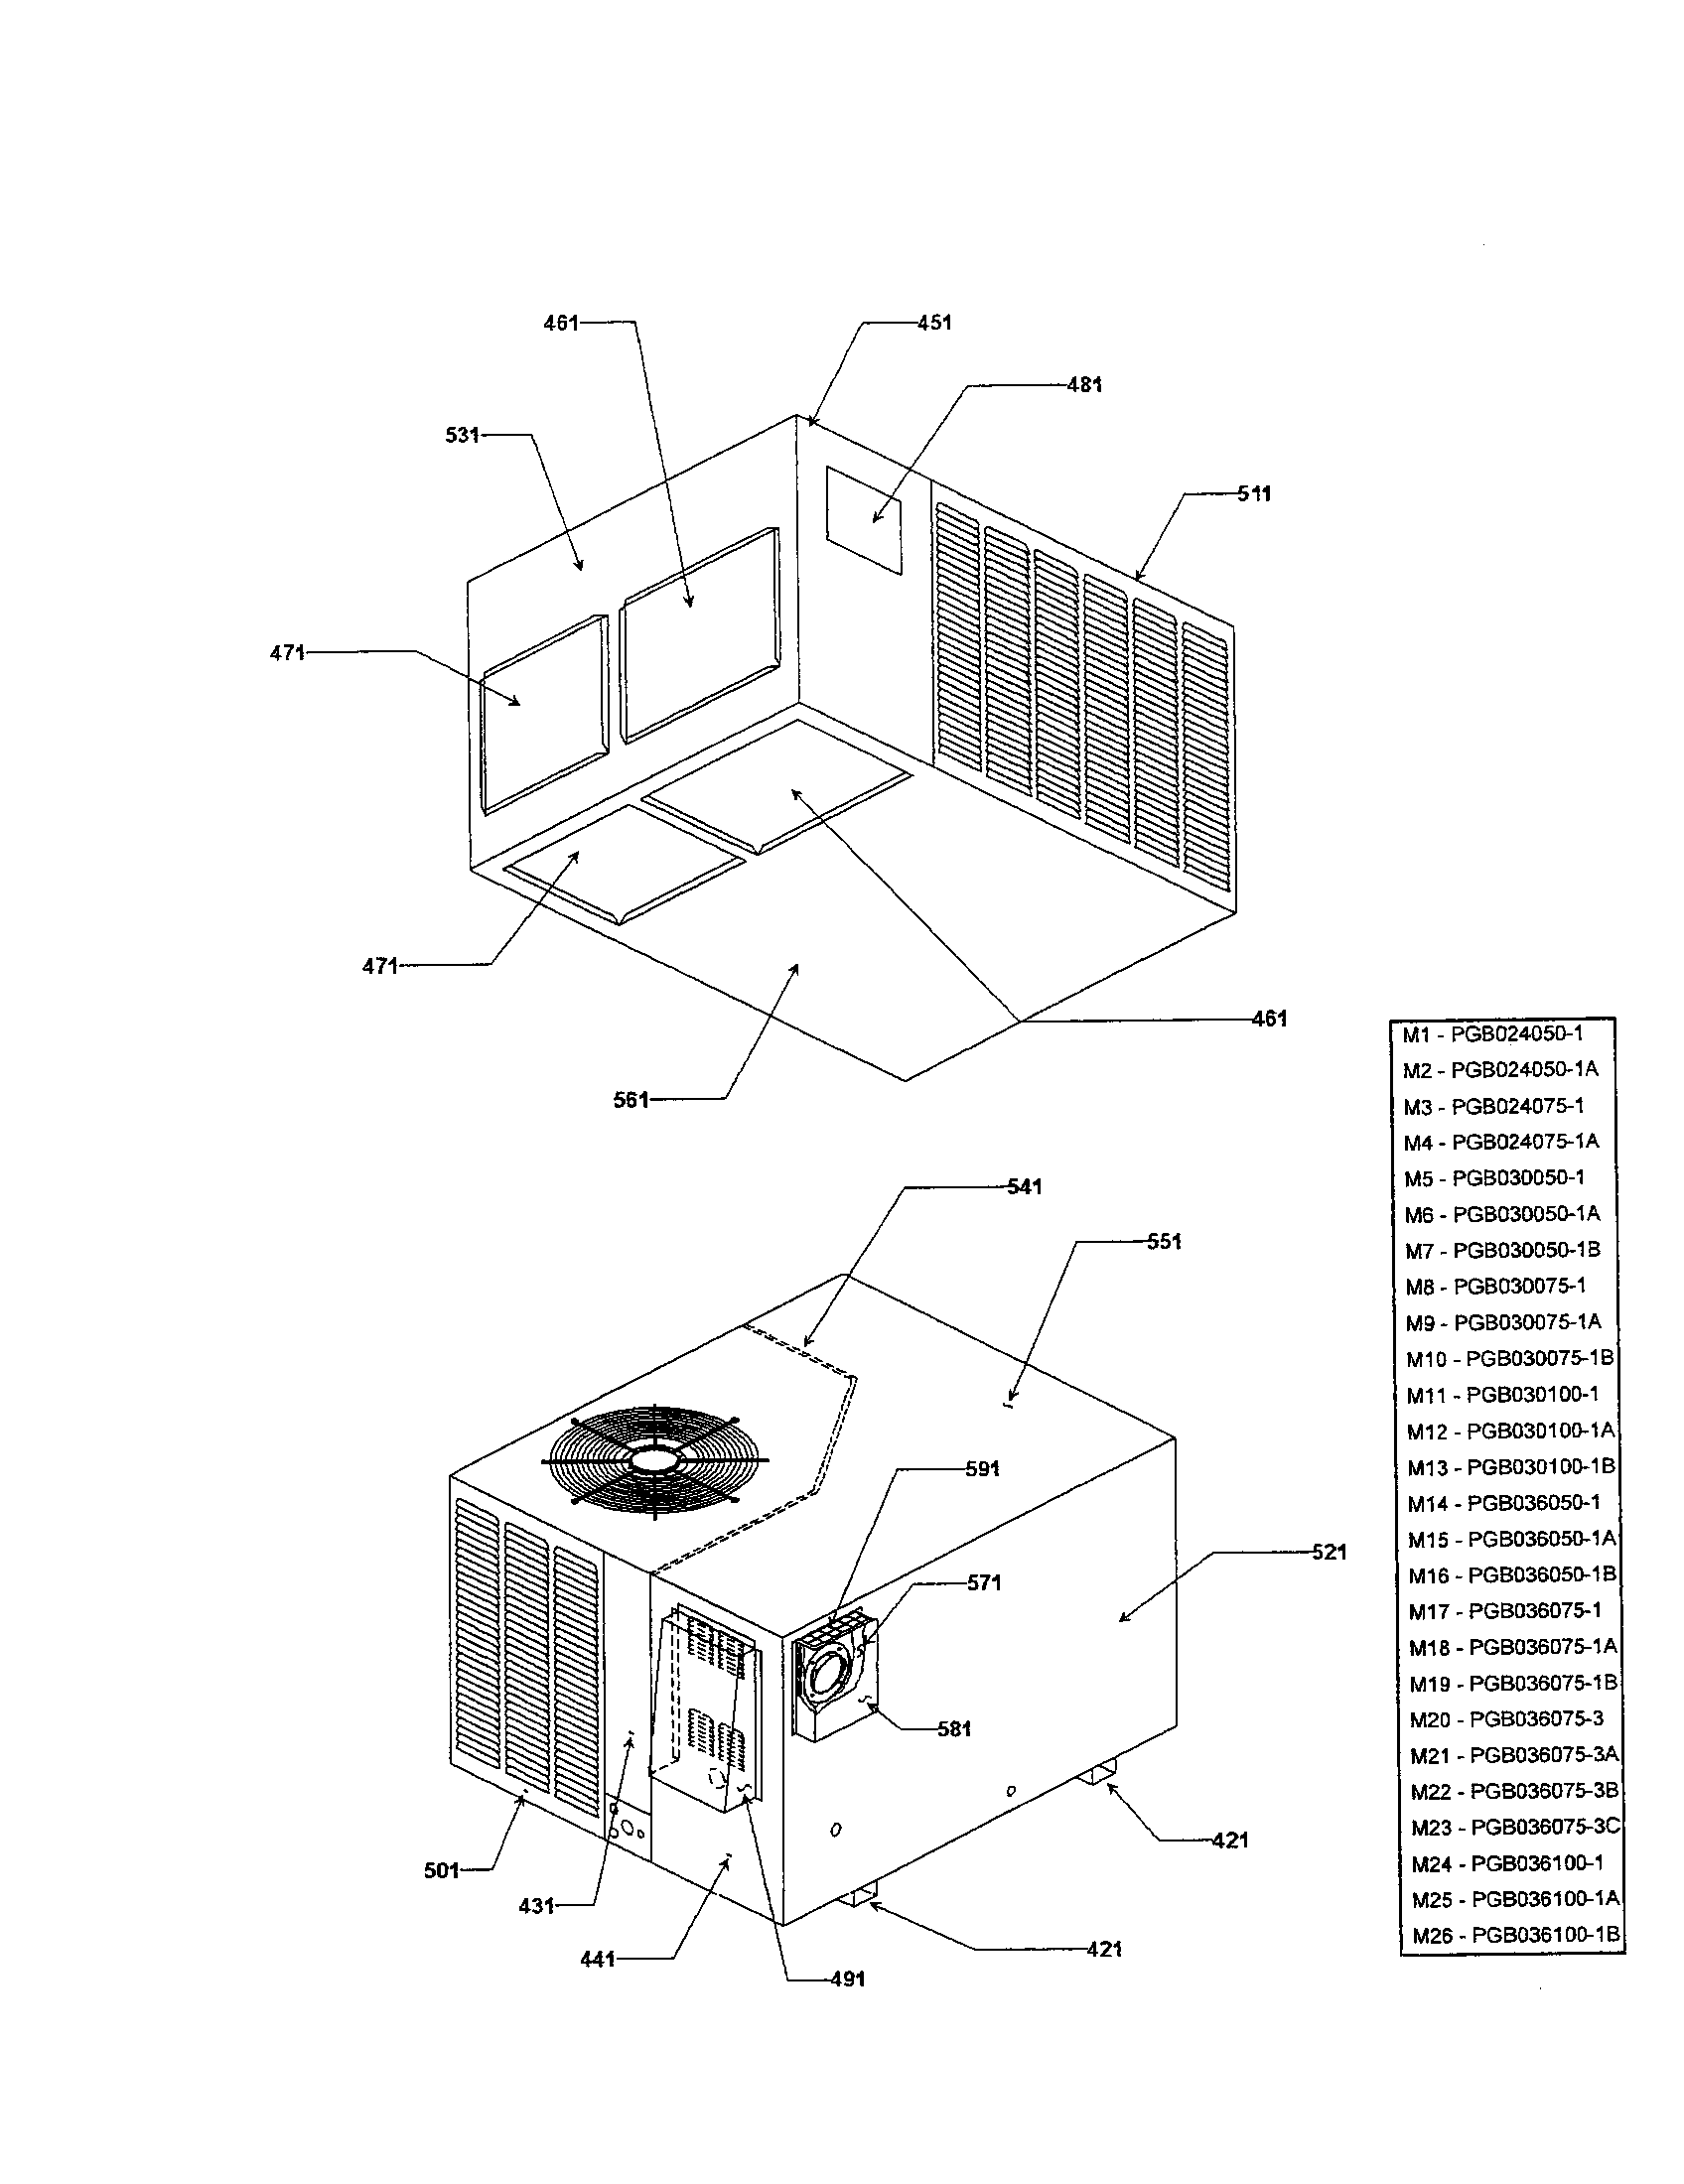 Goodman model PGB030100-1 package units(both units